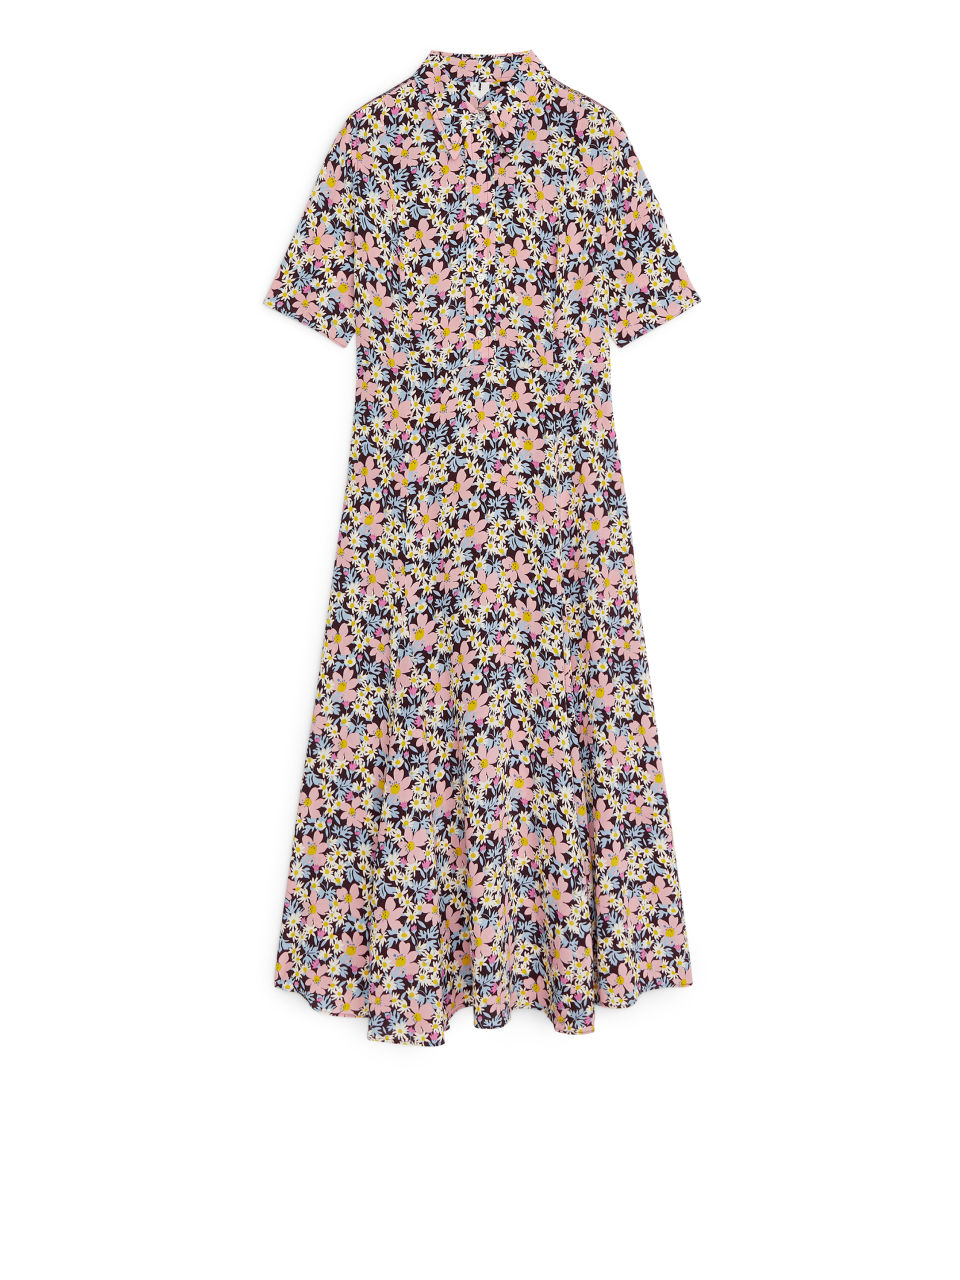 Floral Crêpe Dress - Brown